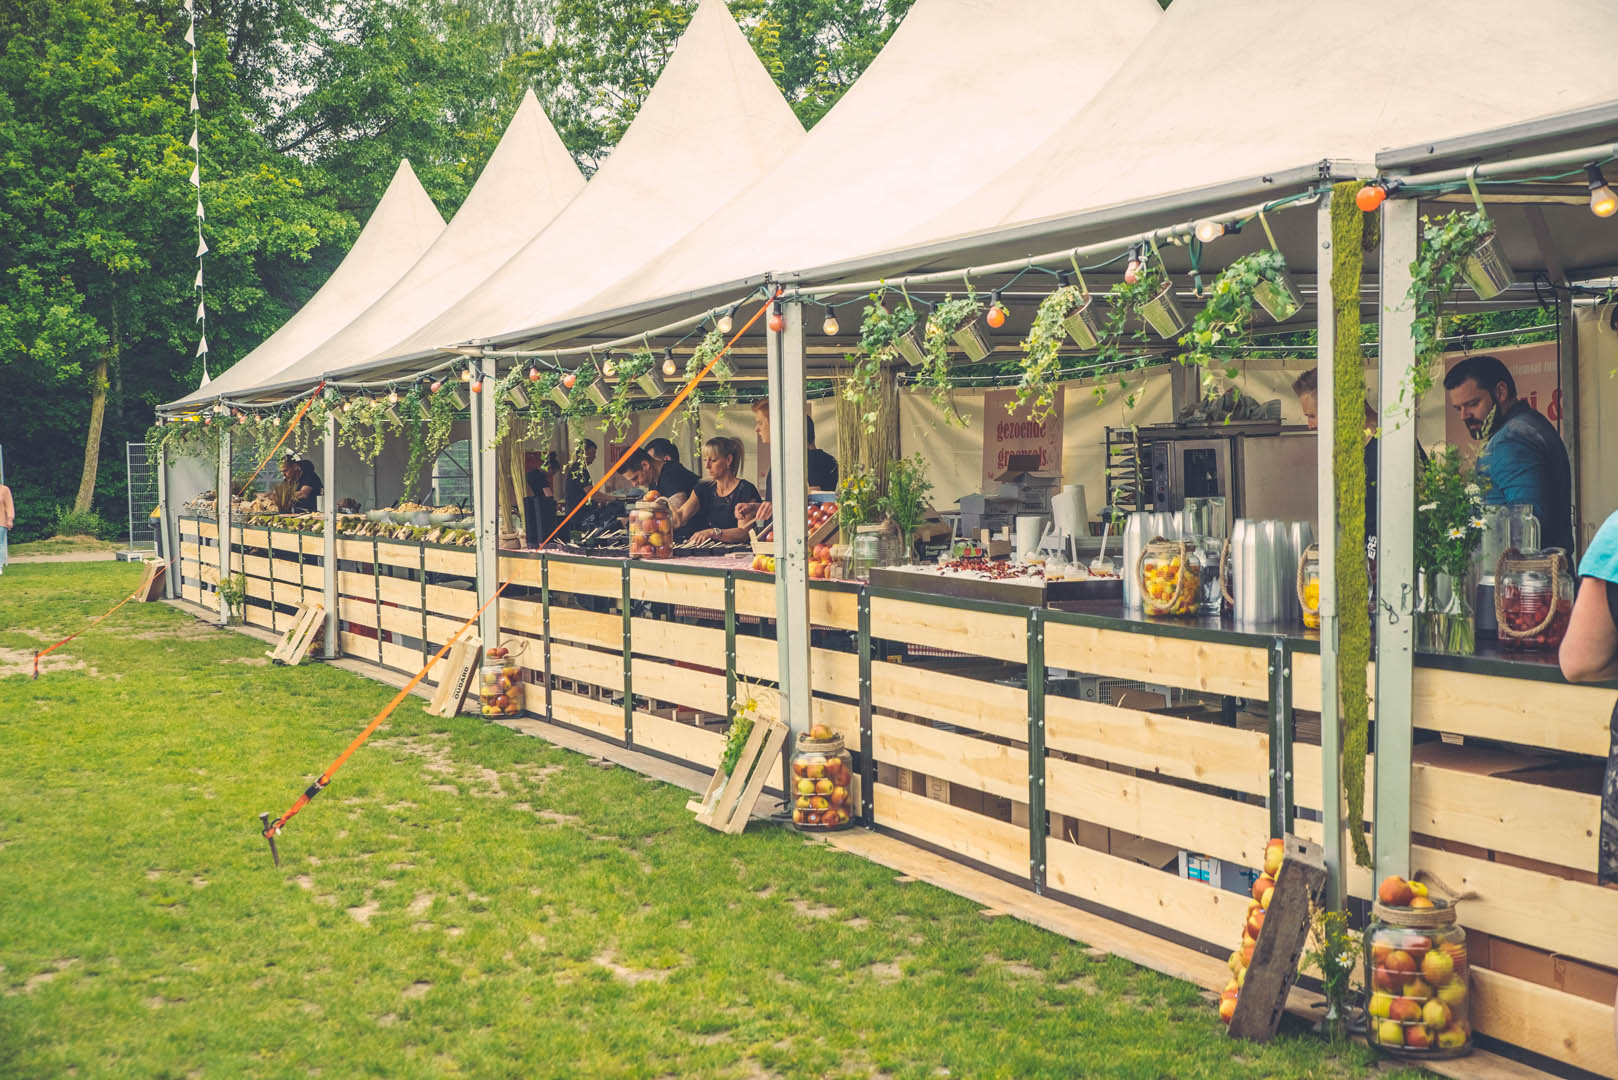 Stad Gent Picknick Event Eetkramen